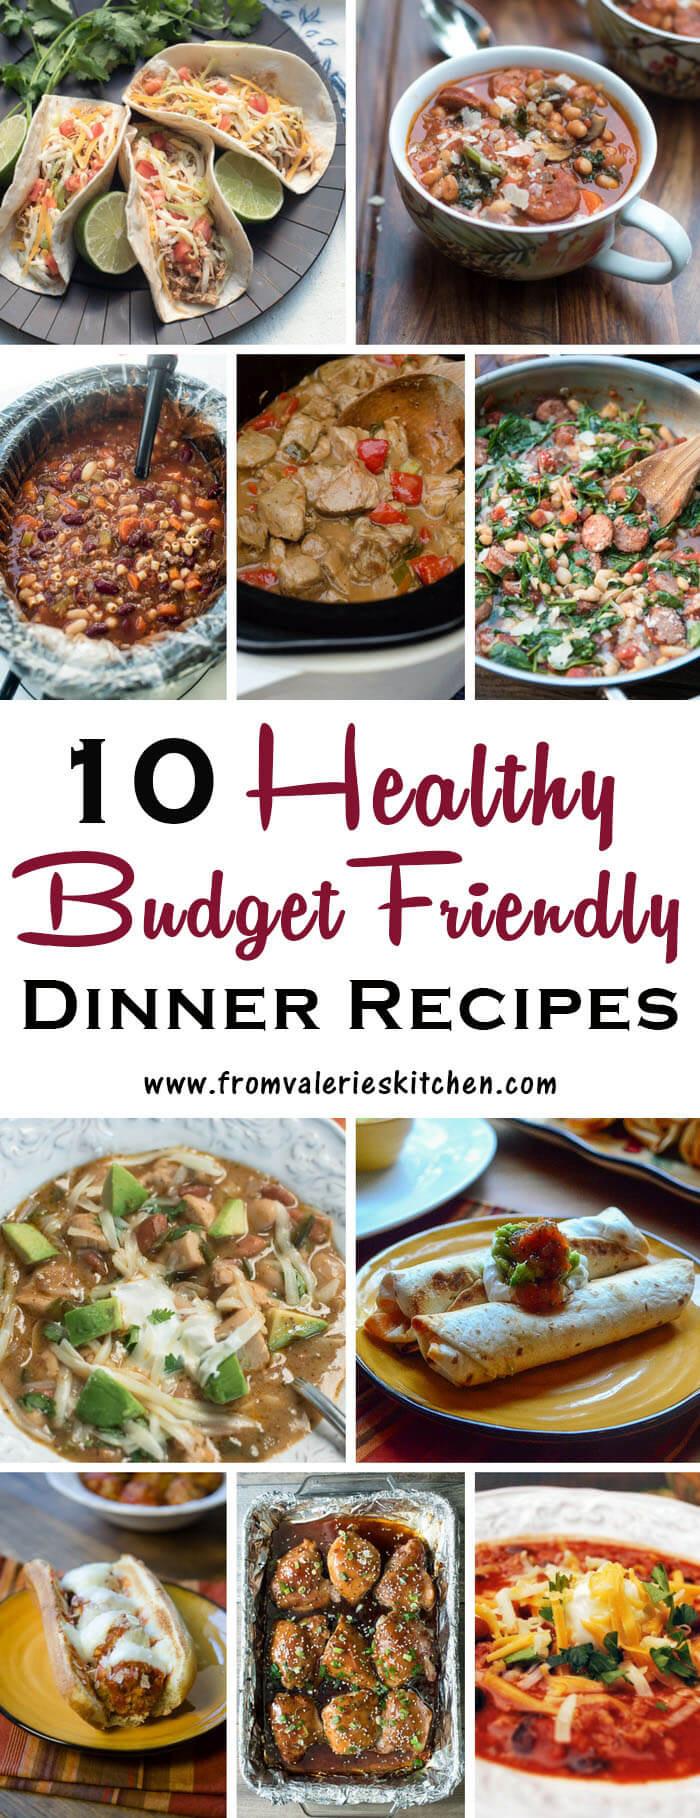 Healthy Dinner Ideas Pinterest  10 Healthy Dinner Recipes on a Bud Valerie s Kitchen